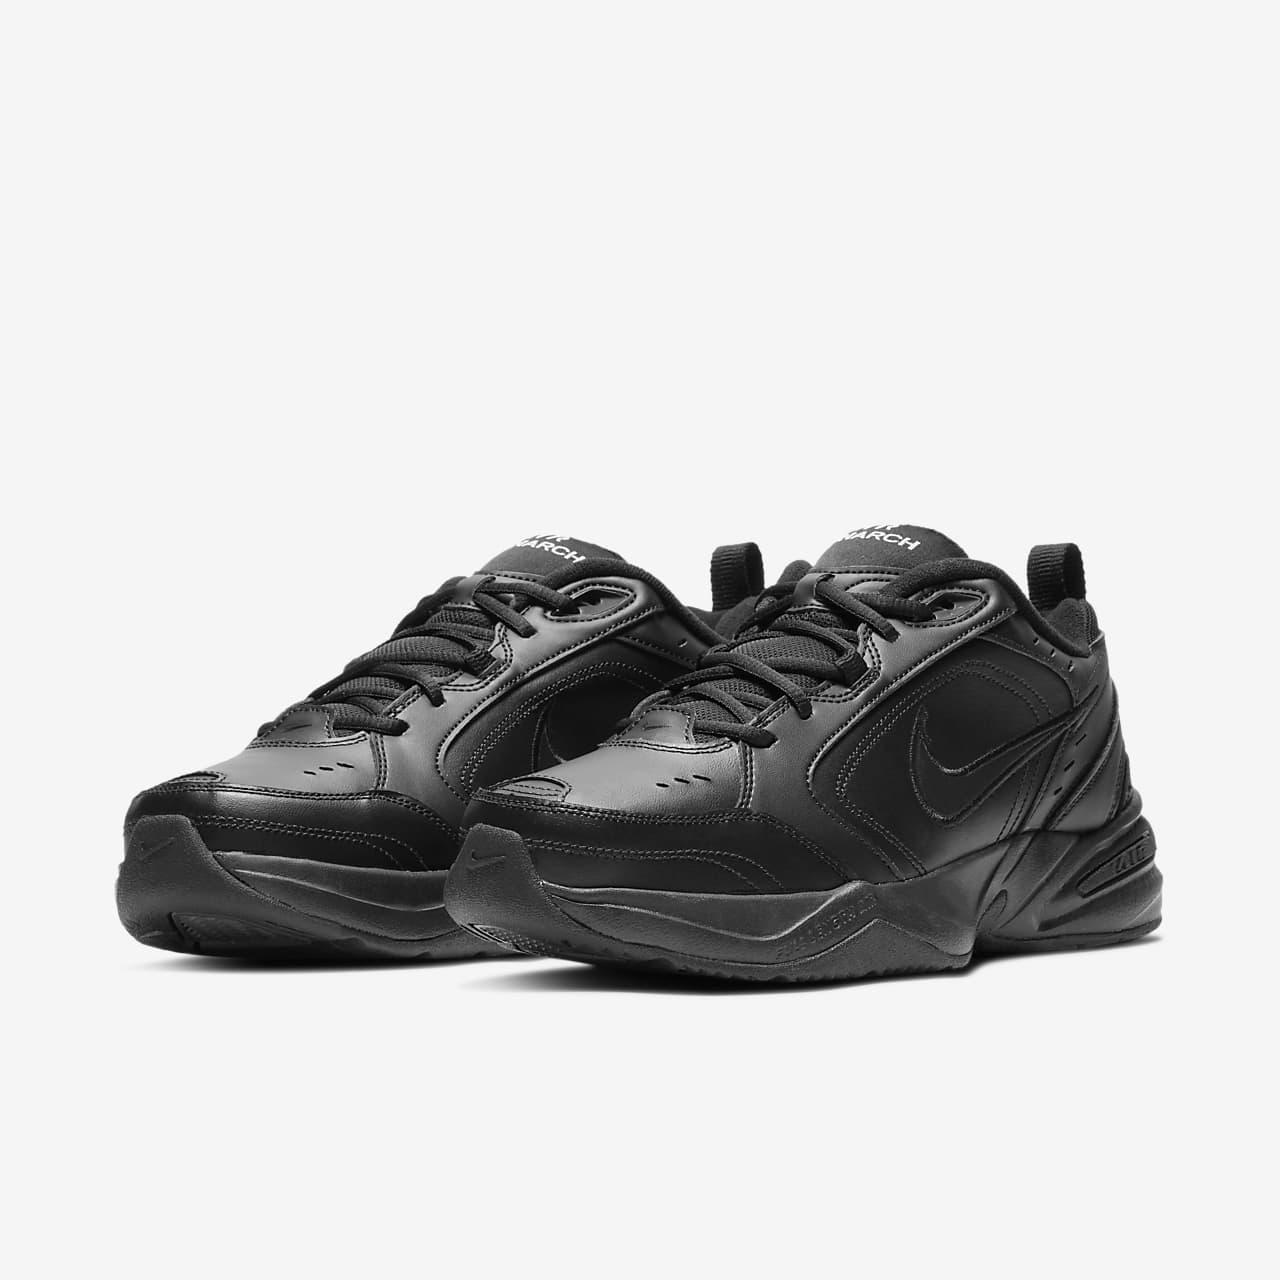 ... Nike Air Monarch IV Unisex Training Shoe